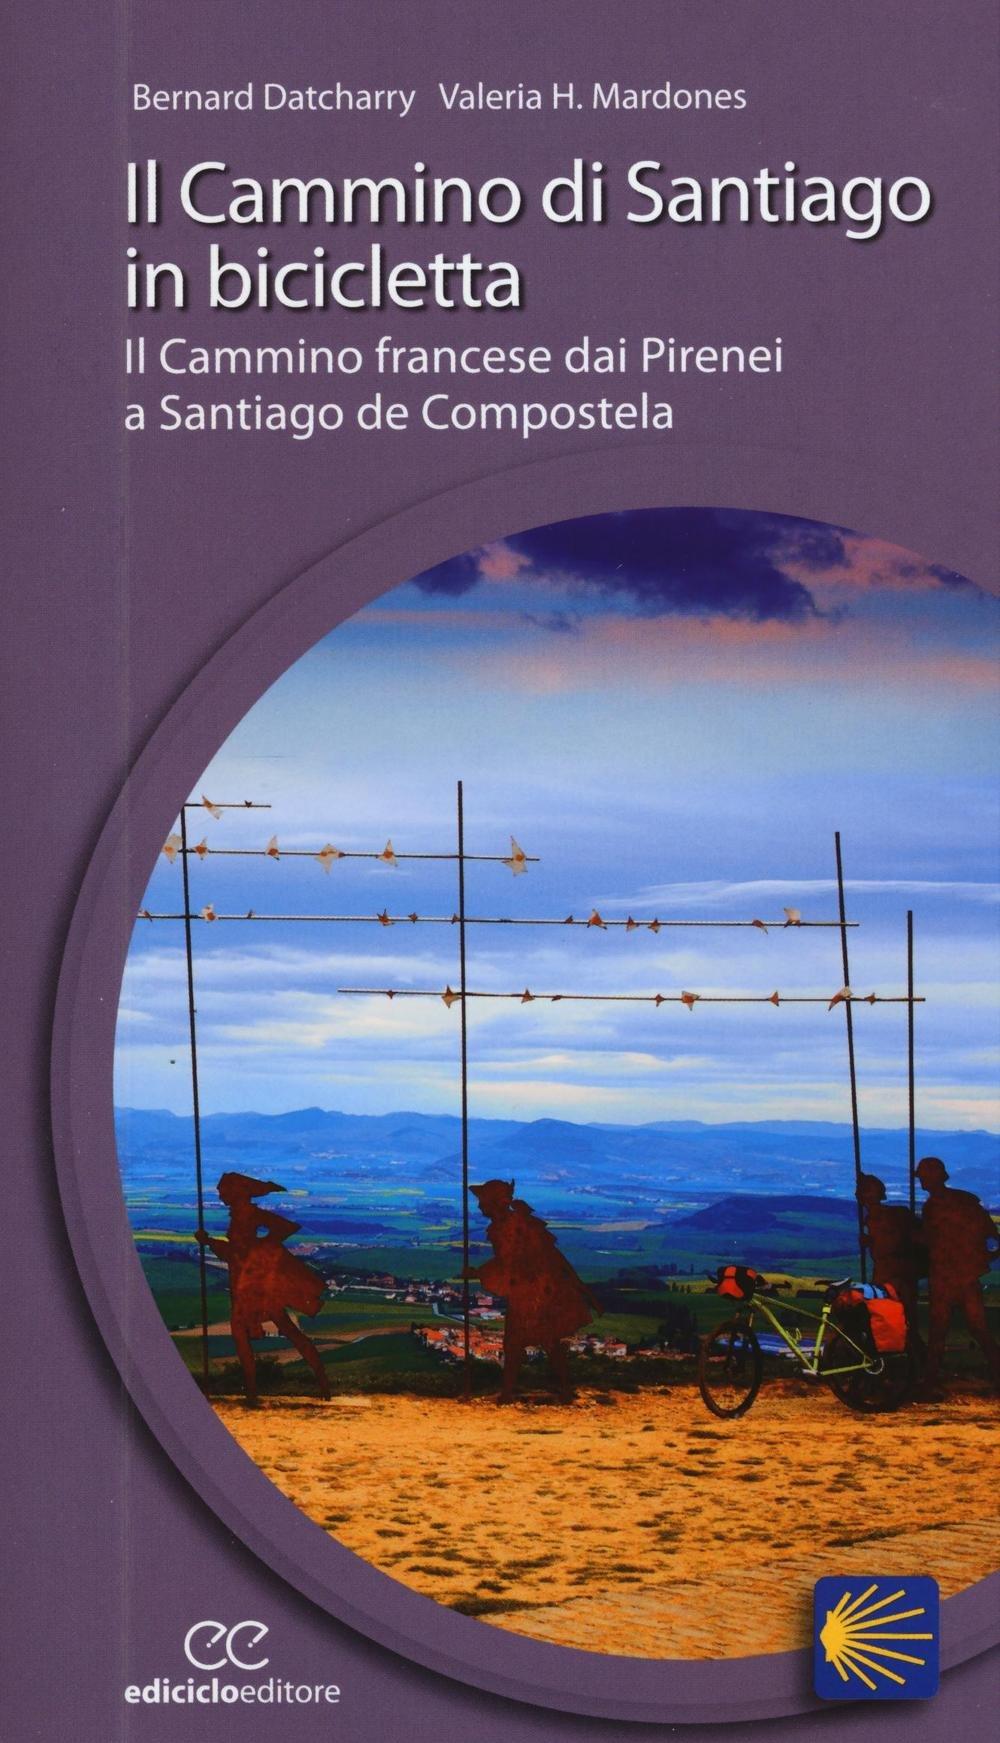 Amazon.it  Il cammino di Santiago in bicicletta - Bernard Datcharry ... 4eaec36d06a